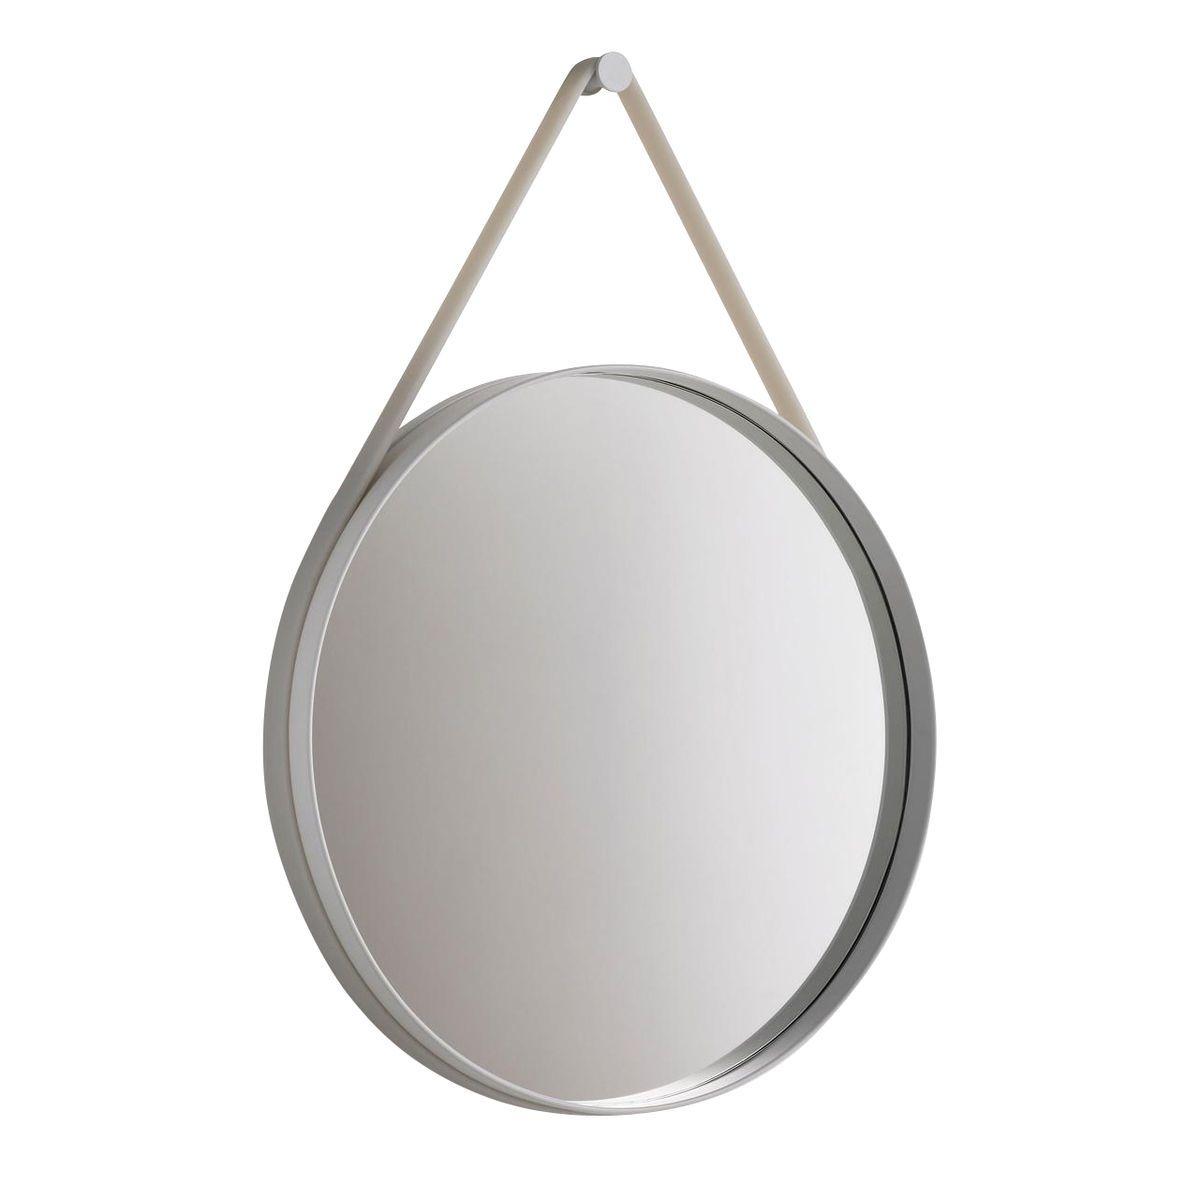 strap mirror spiegel hay. Black Bedroom Furniture Sets. Home Design Ideas